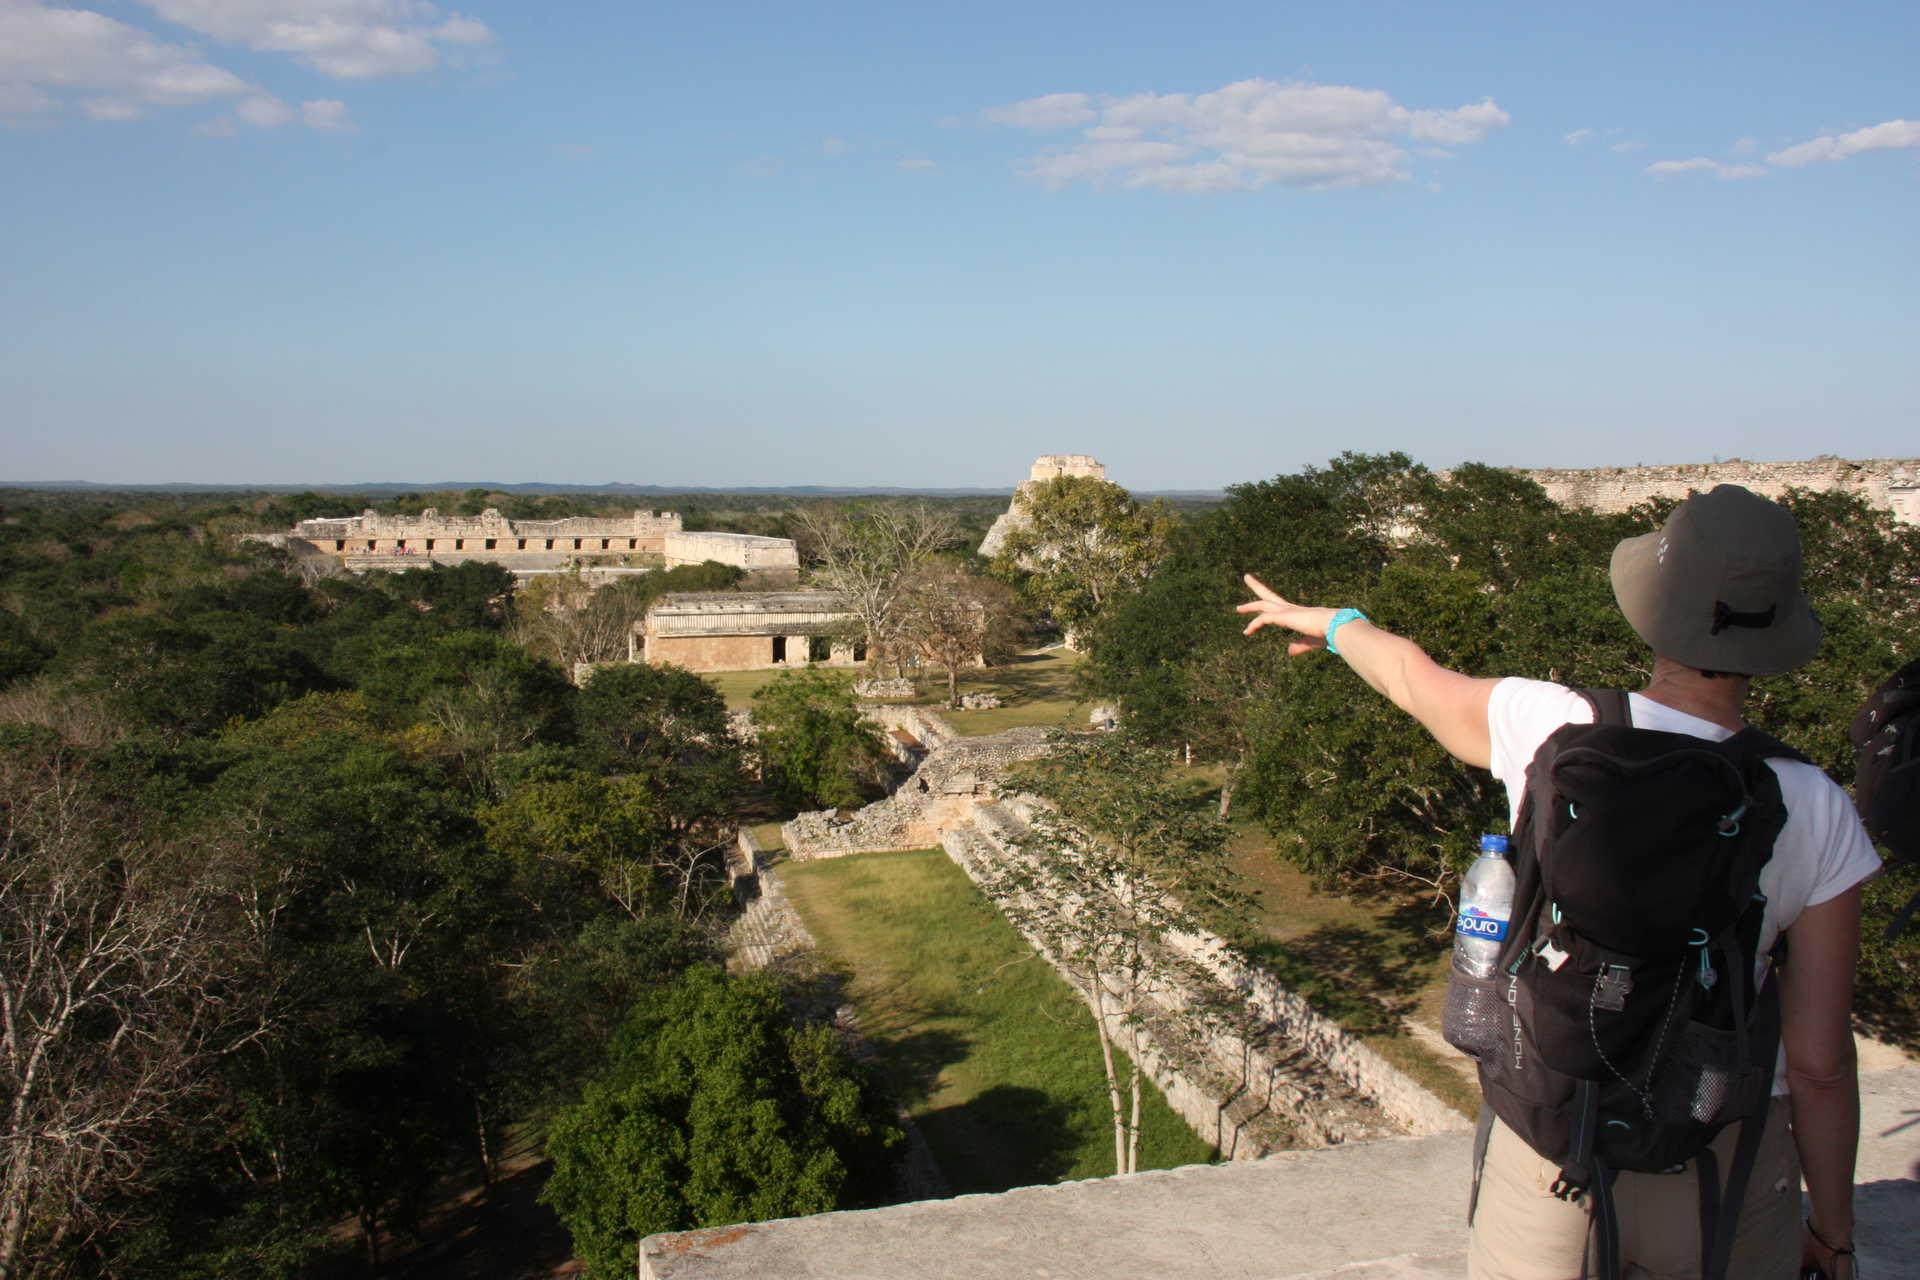 voyage découverte chiapas yucatan, Uxmal, Chichen Itza, Tulum